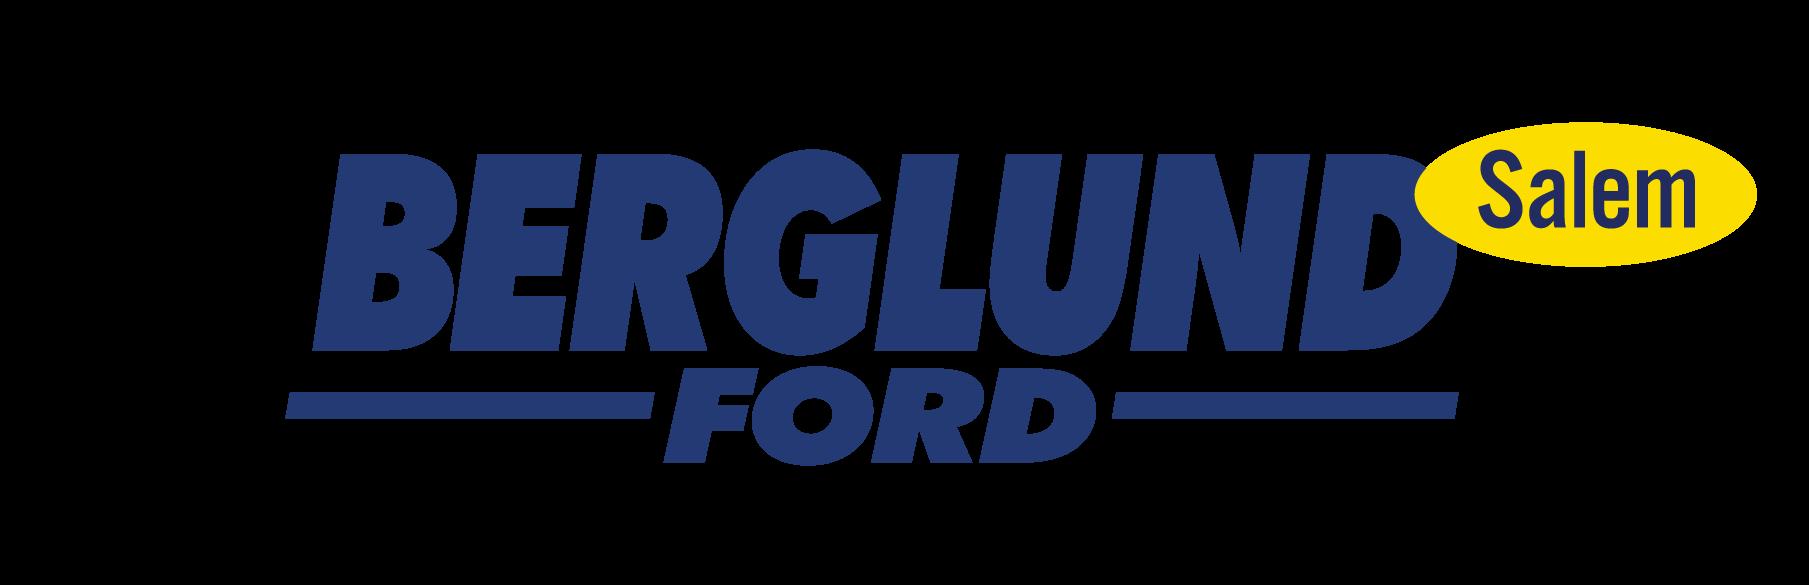 Berglund Ford Salem